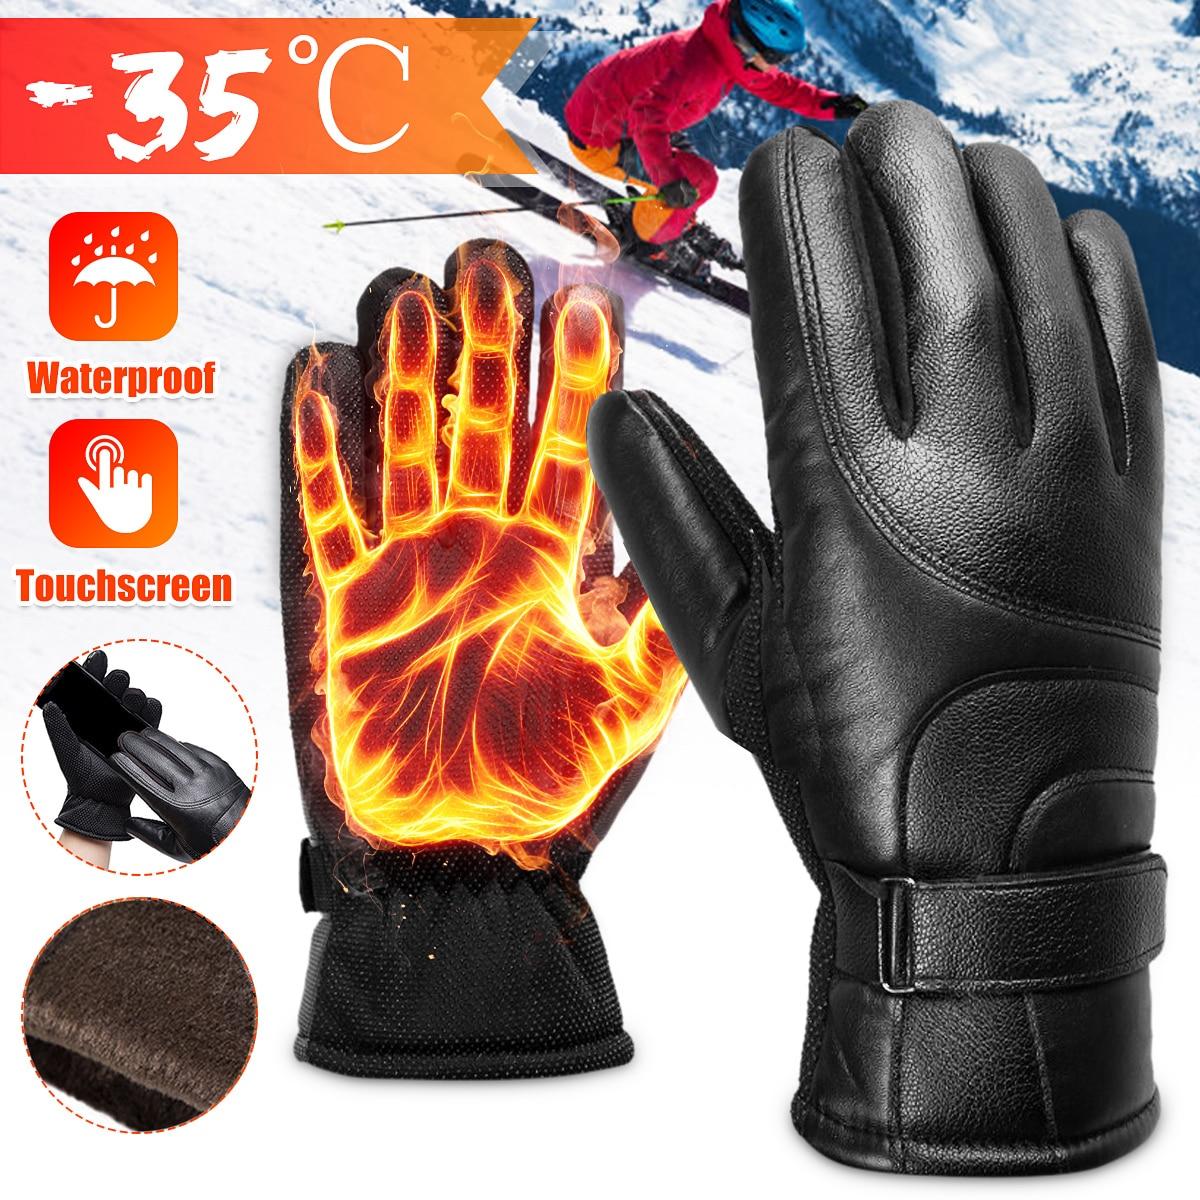 Guantes de Moto para hombre, Guantes de Moto de carreras para hombre, Guantes de Moto para Motocross, Guantes Térmicos cálidos para invierno para ciclismo, Guantes de dedos completos